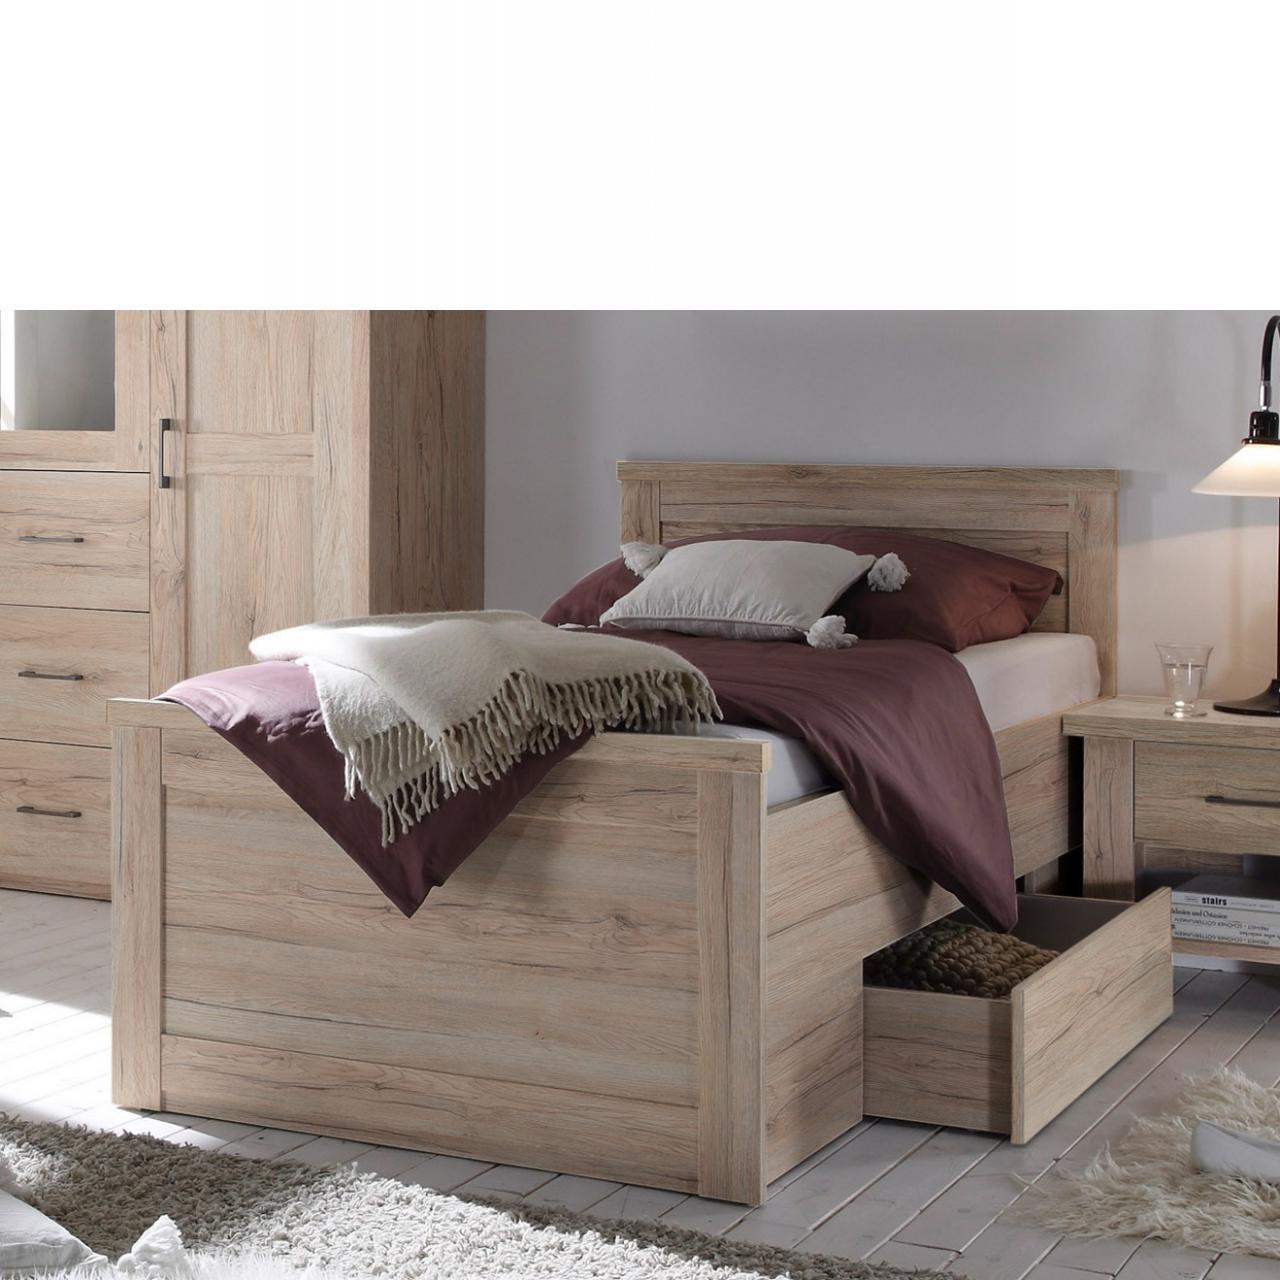 komfort bett luca m bel j hnichen center gmbh. Black Bedroom Furniture Sets. Home Design Ideas